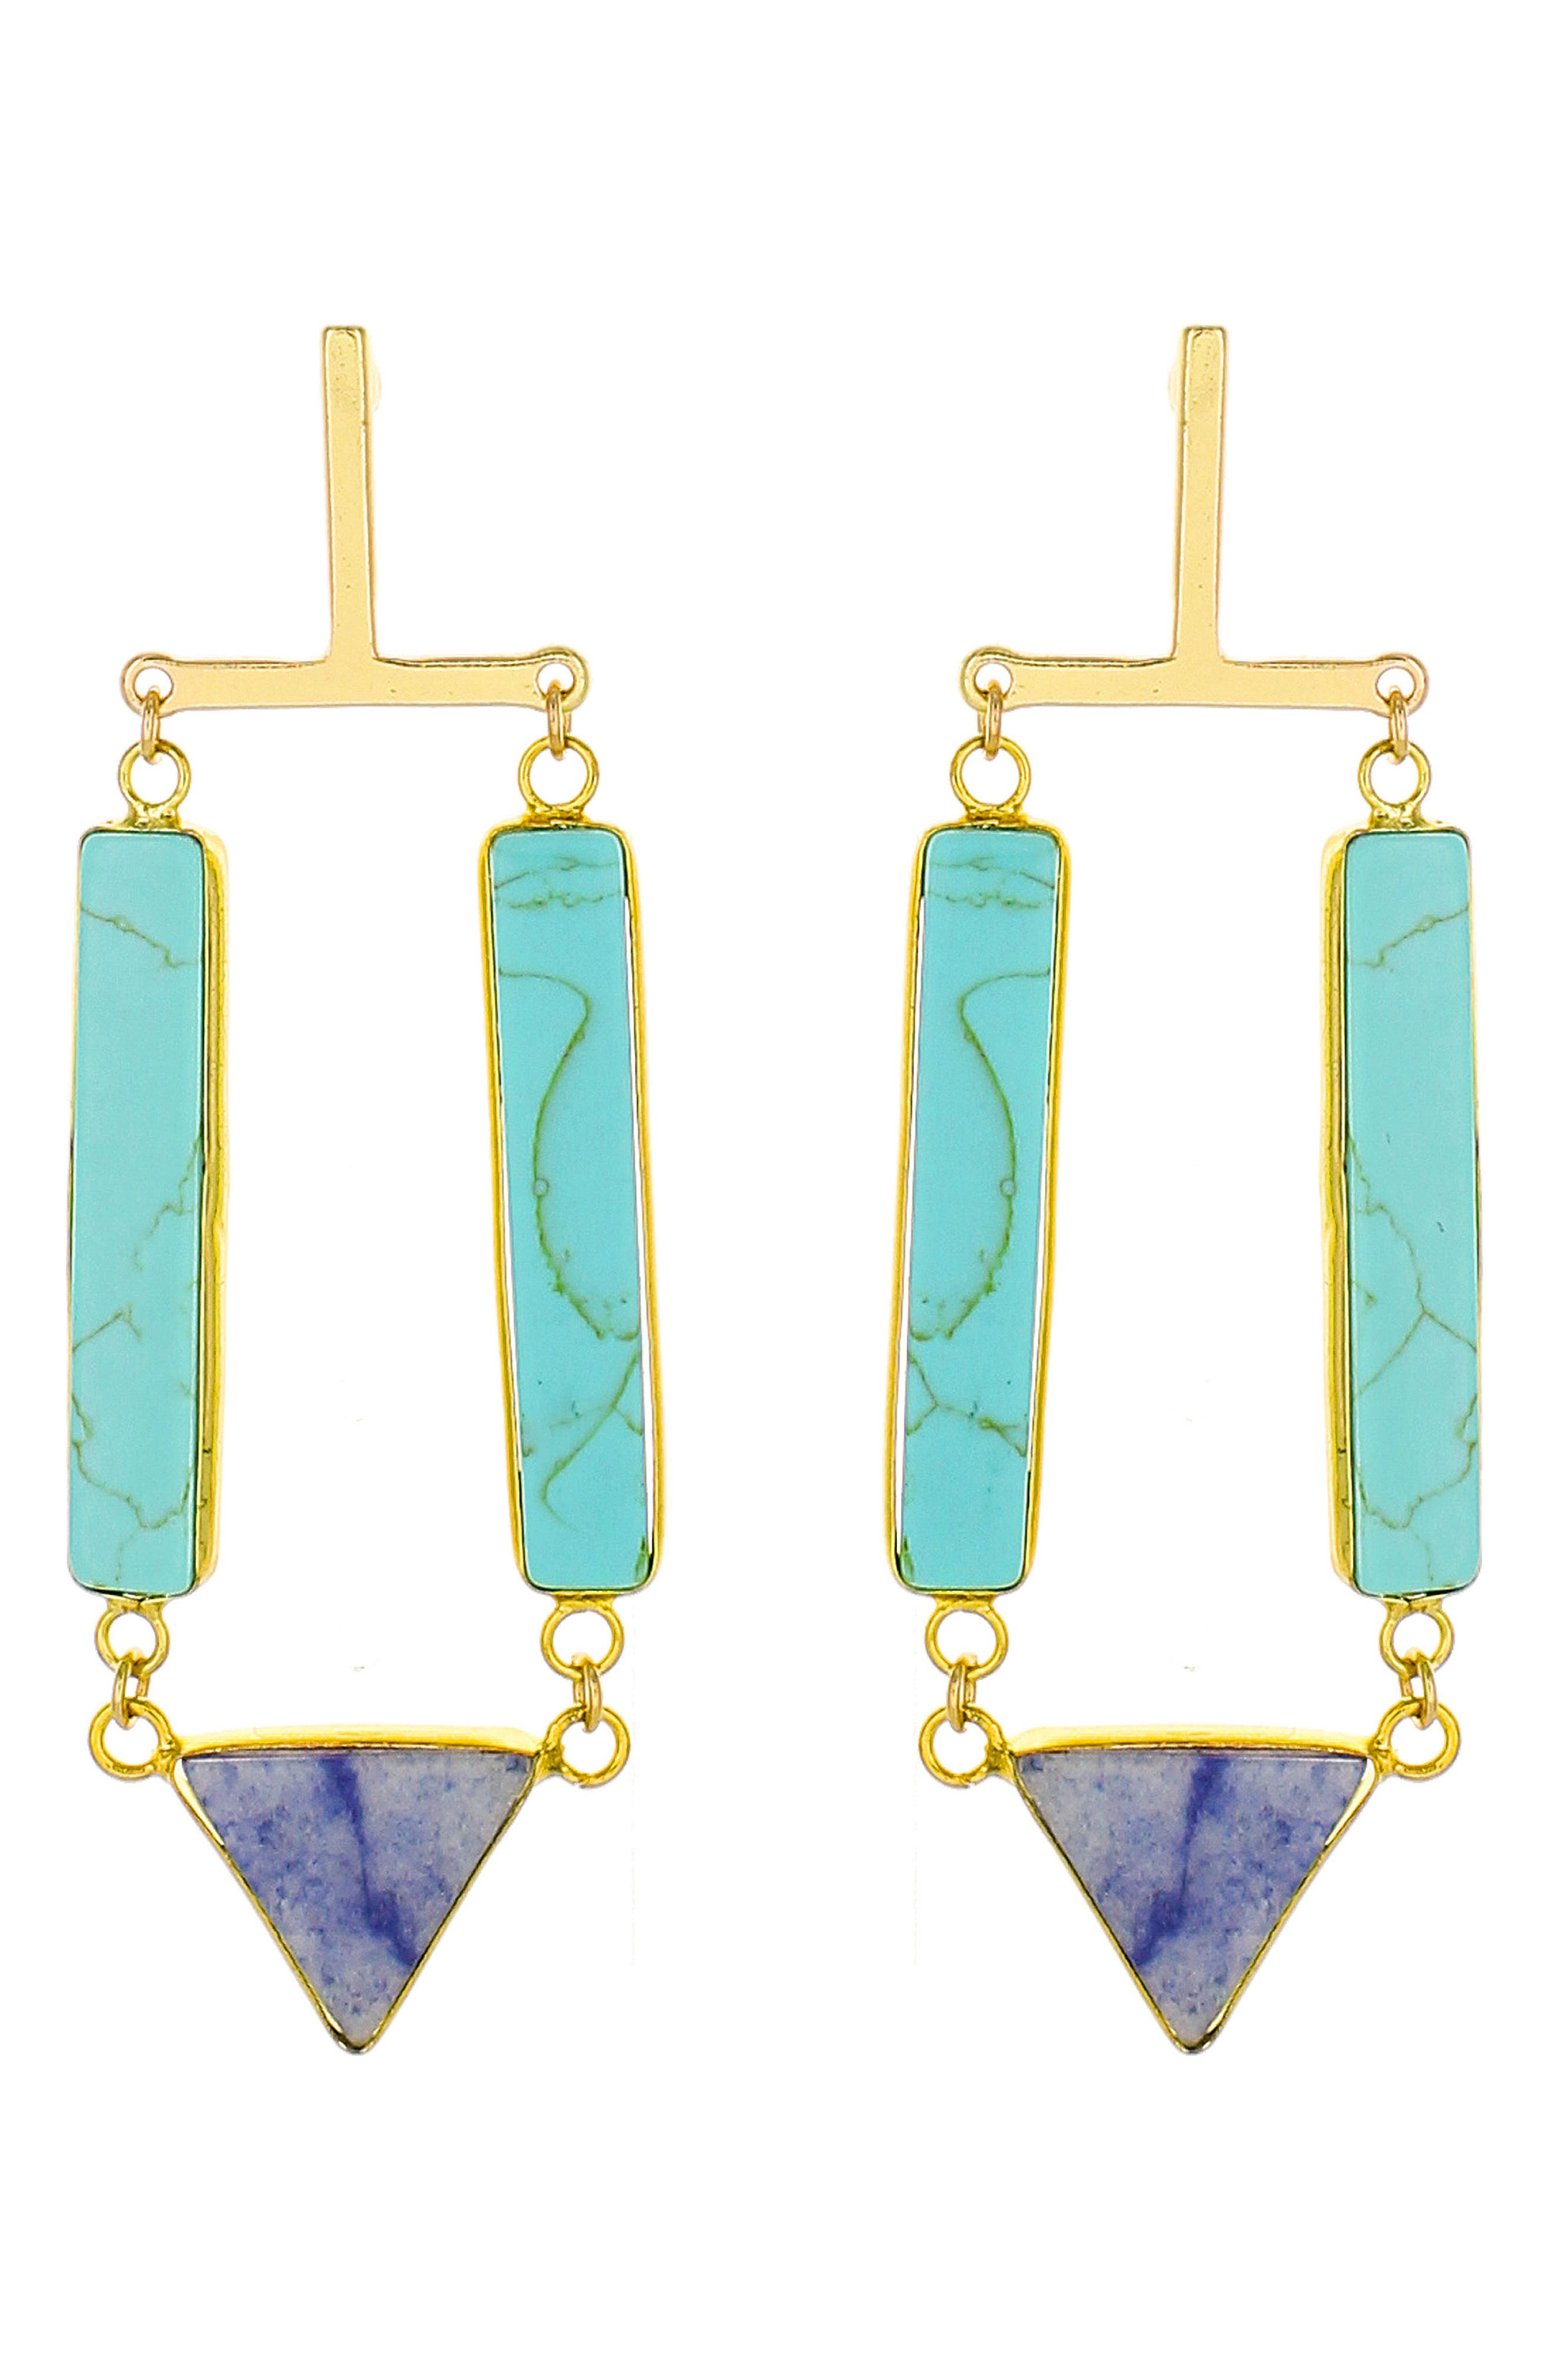 Stone Drop Earrings,                             Main thumbnail 1, color,                             TURQUOISE/ NAVY MULTI